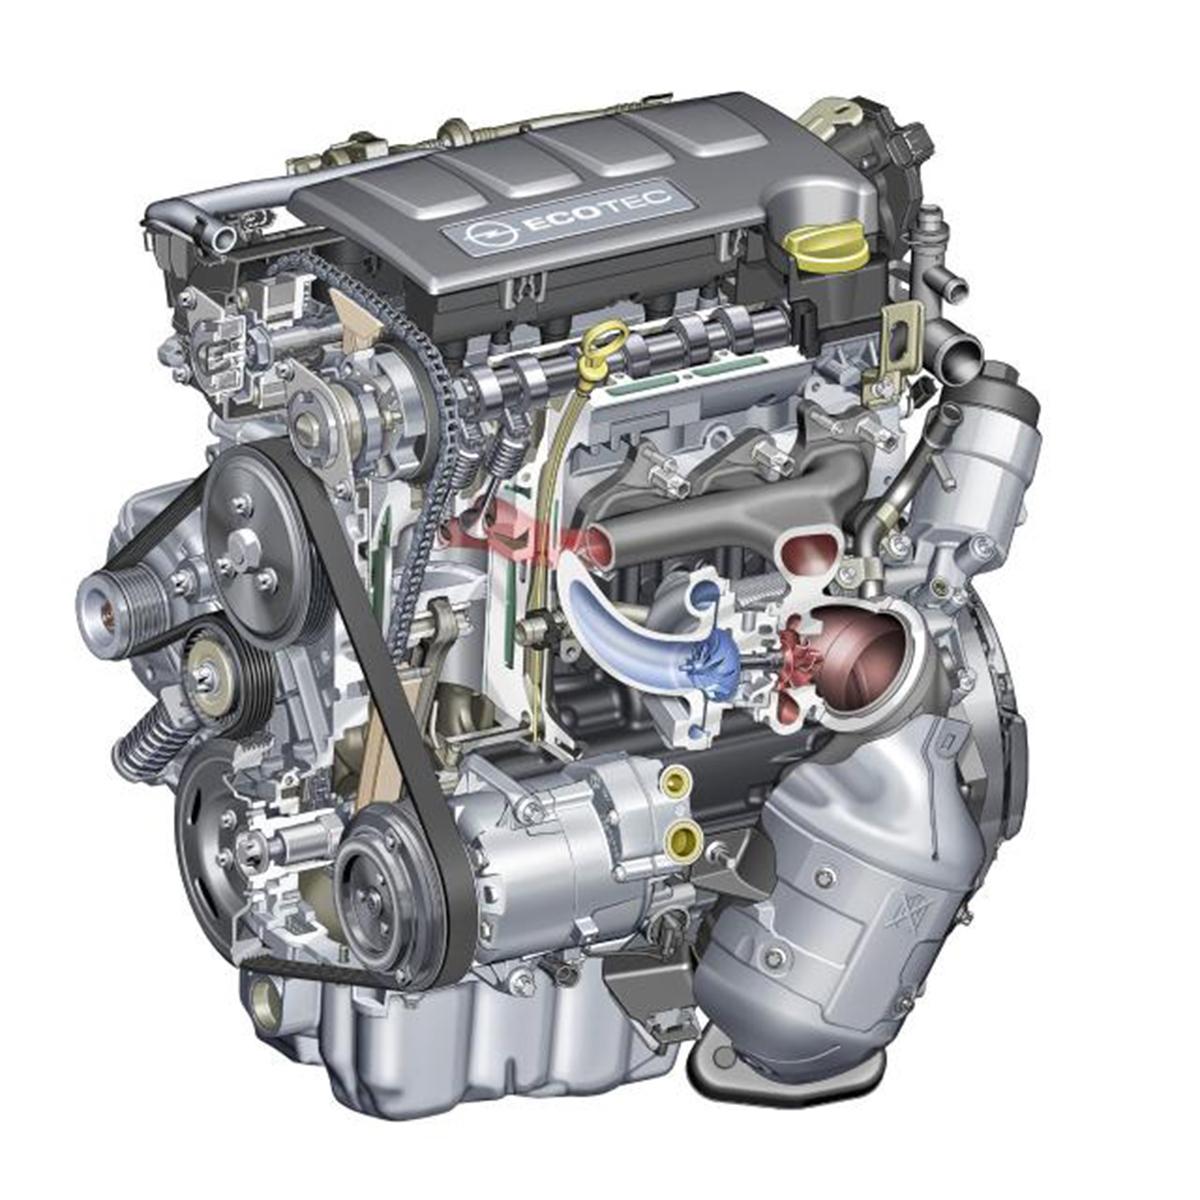 Nuevo Motor Opel 14 Turbo